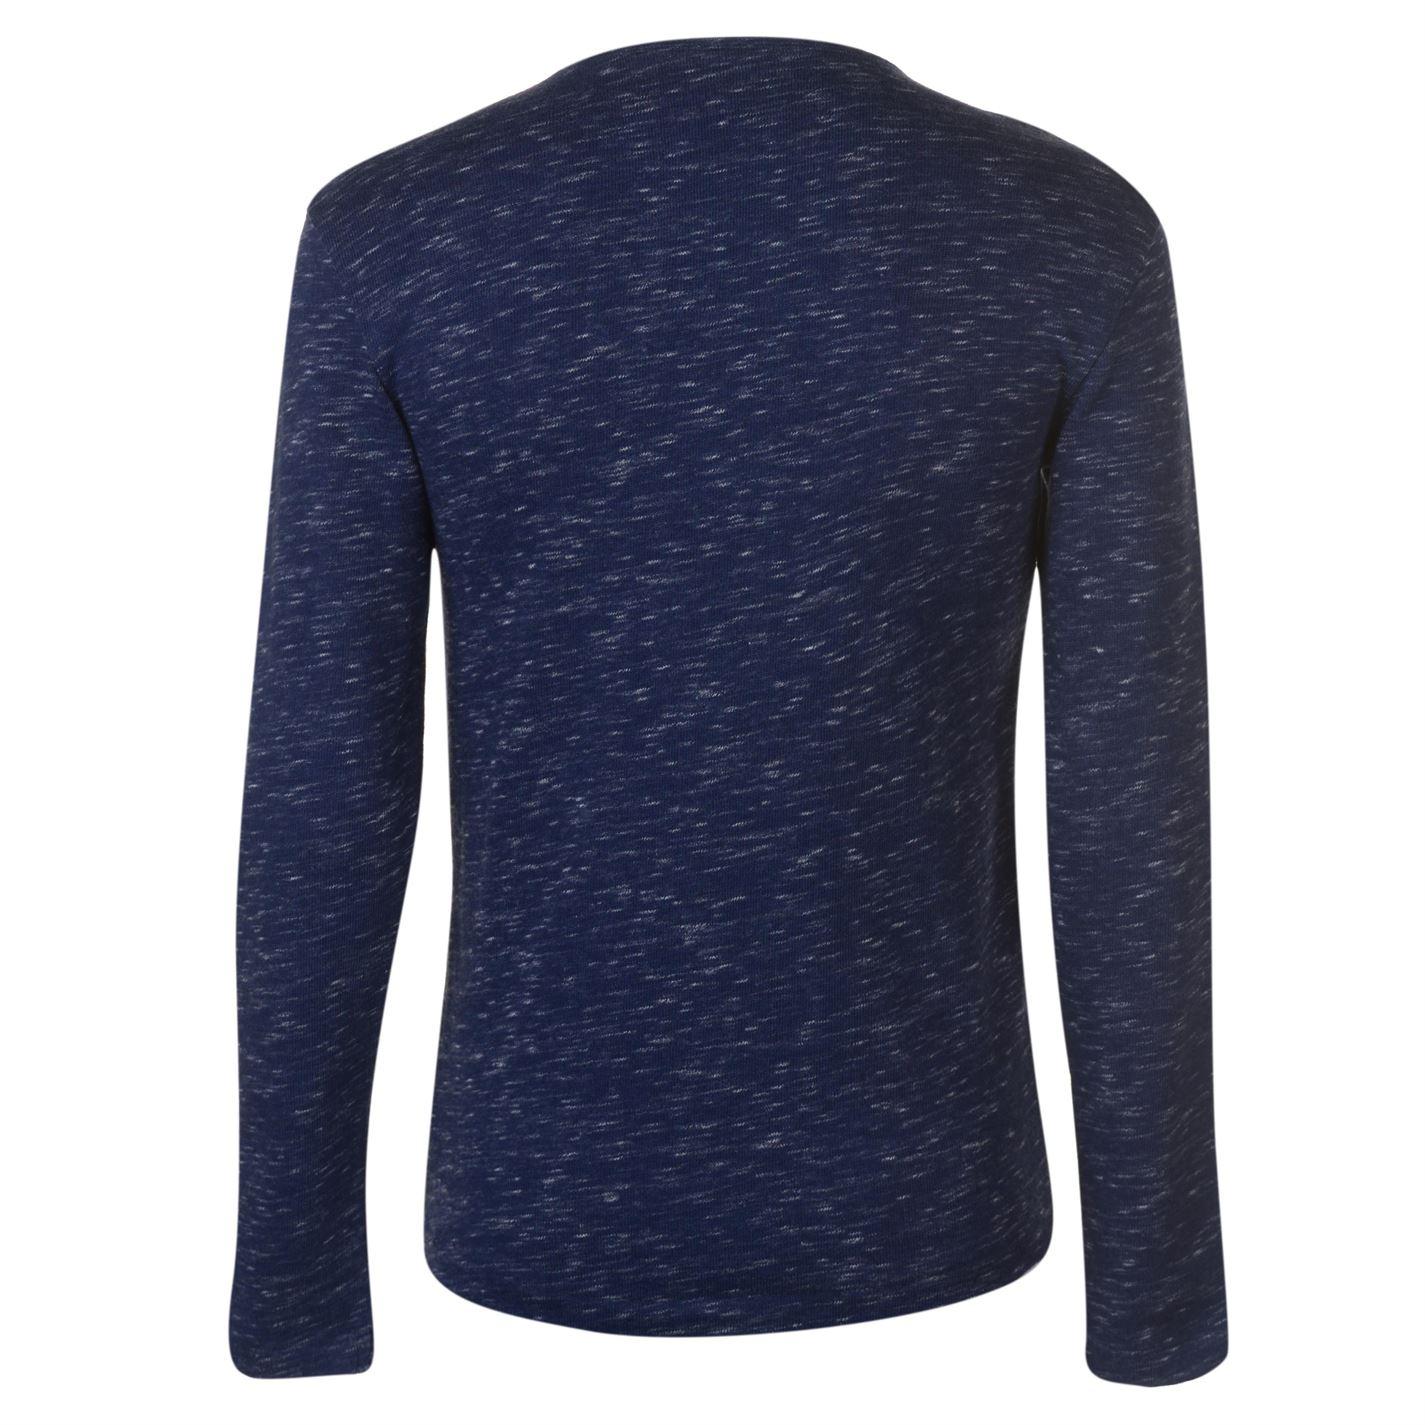 G Star Mens Xauri Granddad Collar Sweater Crew Jumper Pullover Long Sleeve